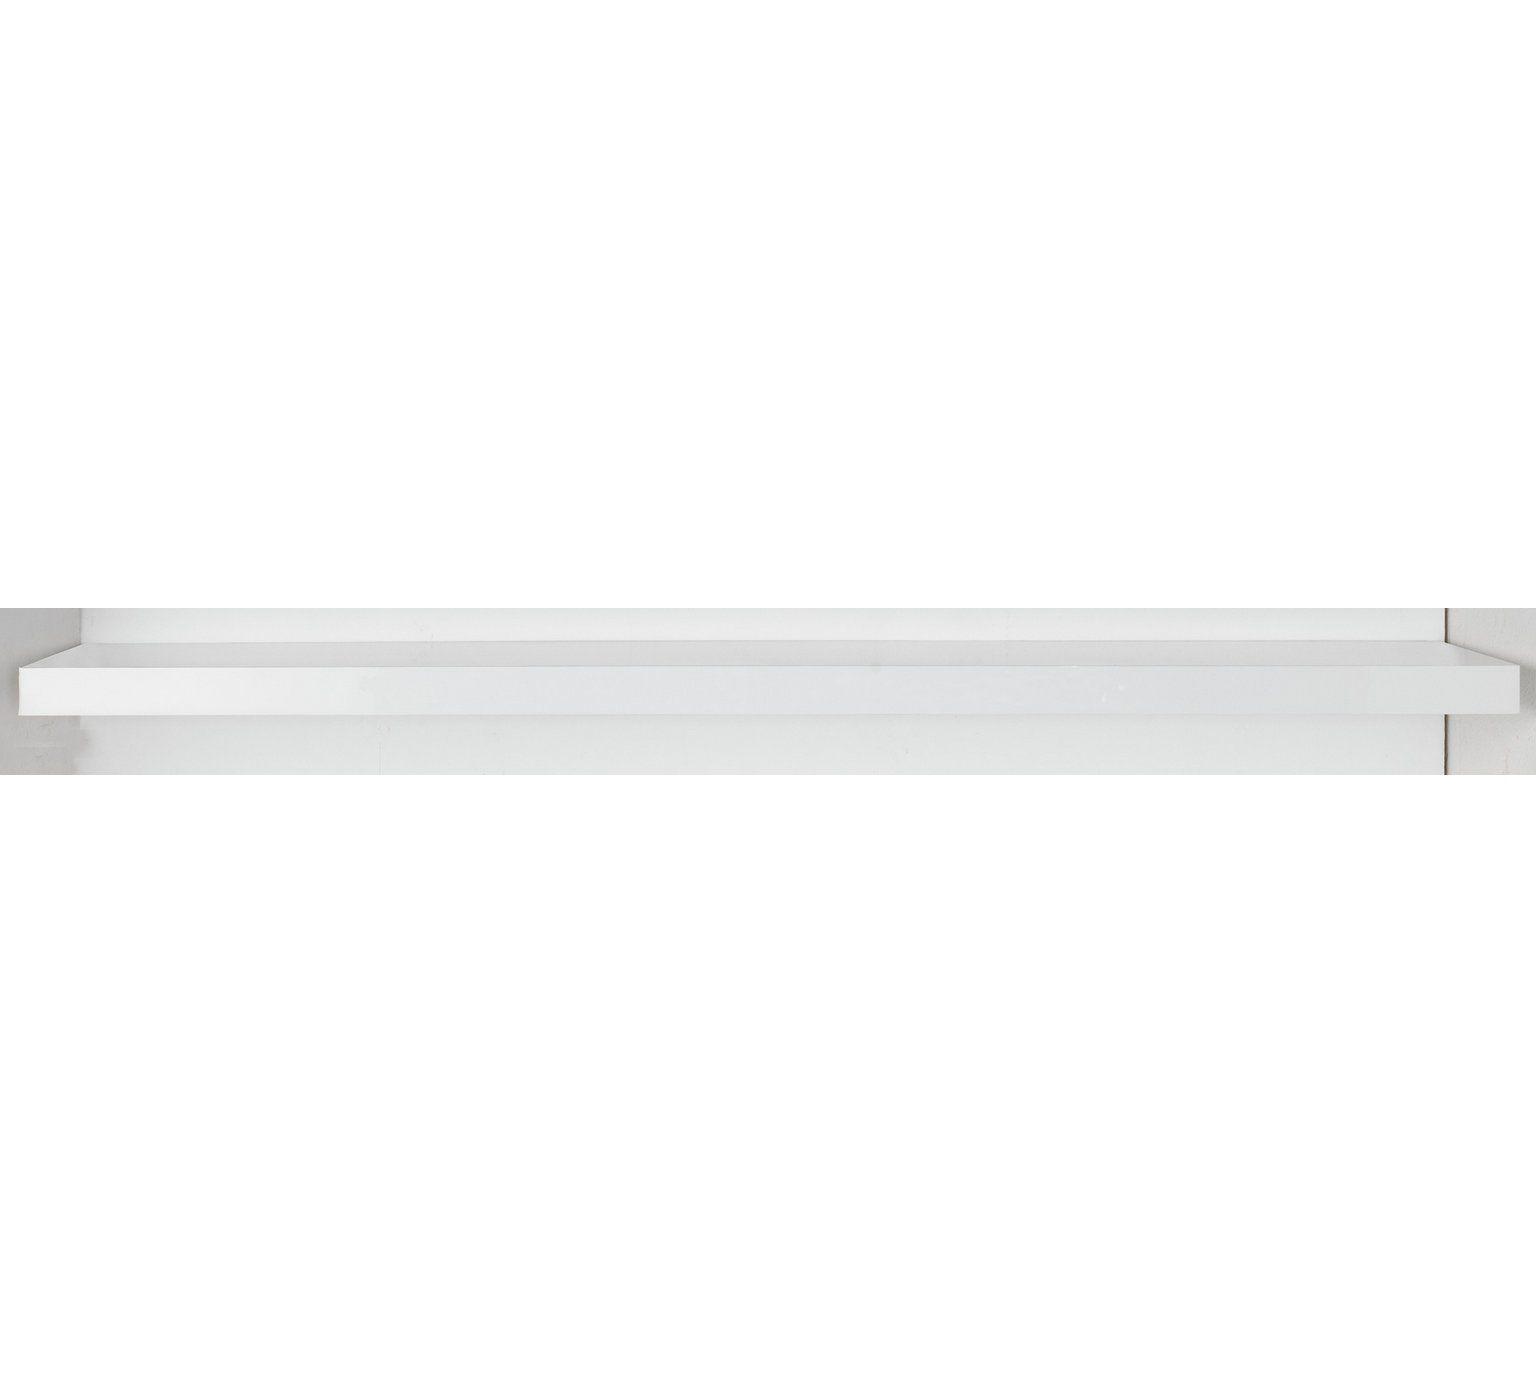 Swell Buy Argos Home Glenmore 120Cm Floating Shelf White Gloss Best Image Libraries Barepthycampuscom